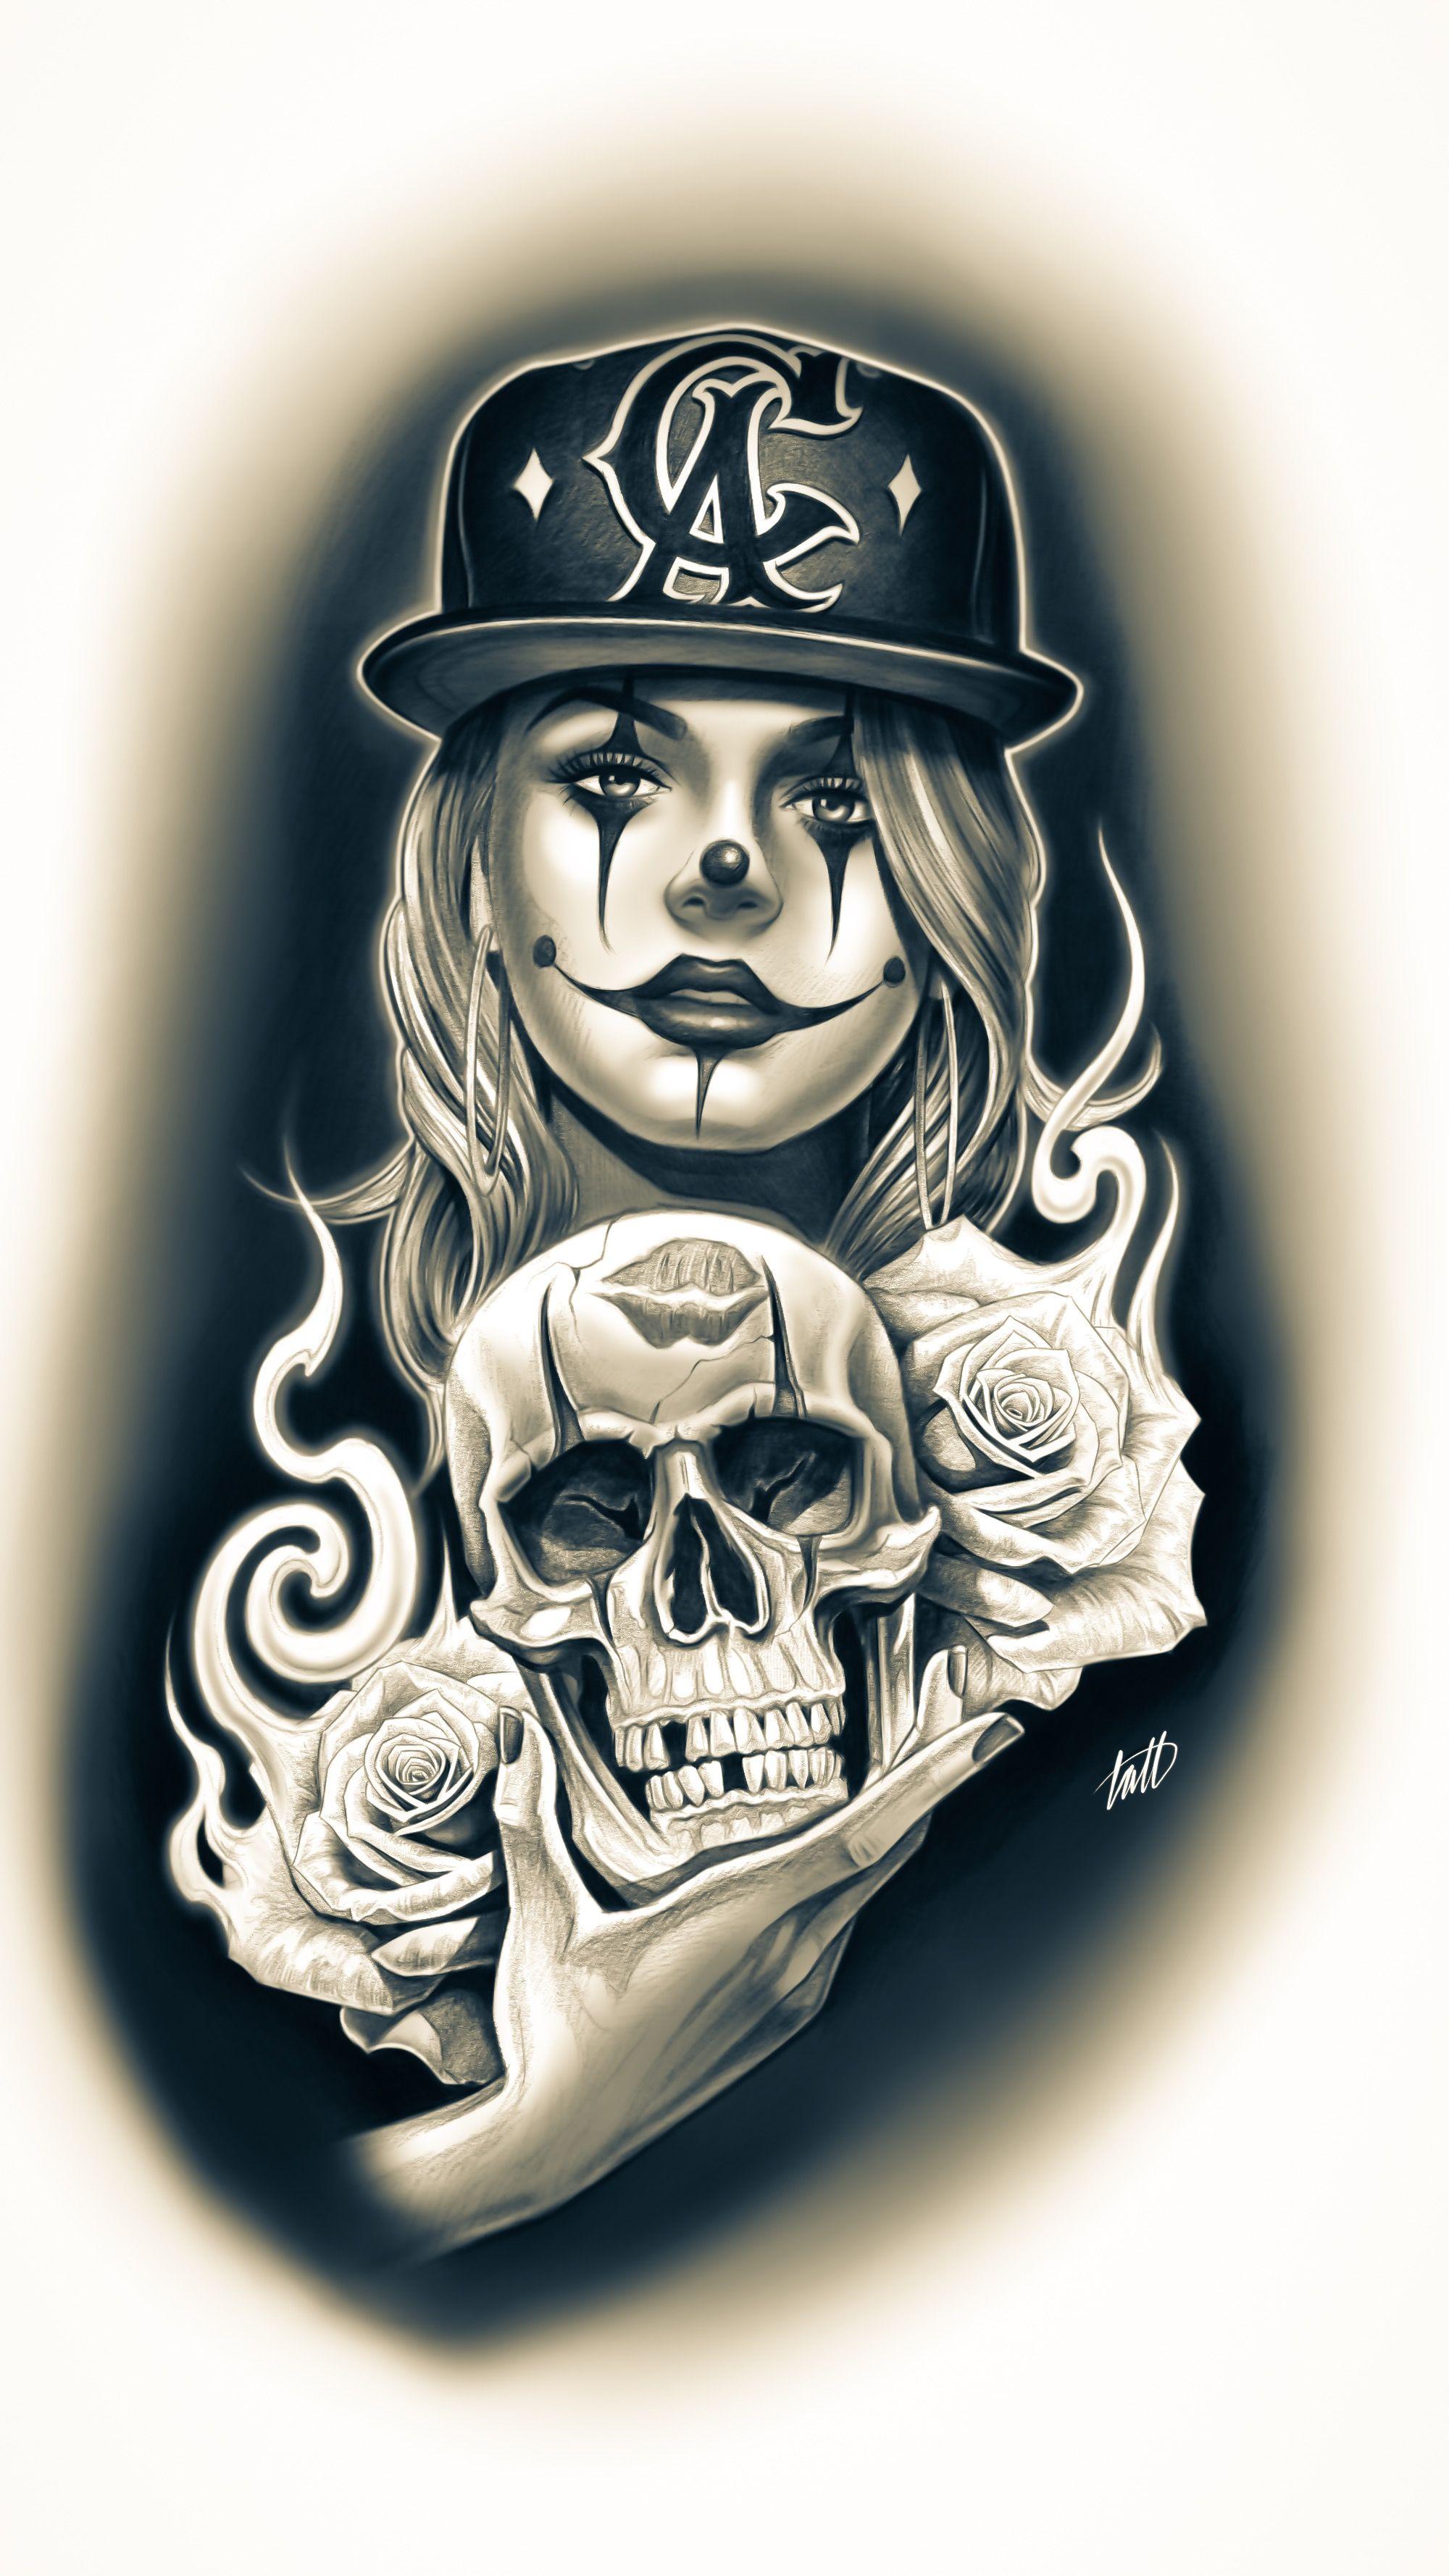 Done On Ipad Design For Tattoo Tattoo Chicanoart Clowngirl Skulls Chicano Drawings Chicano Art Lowrider Art